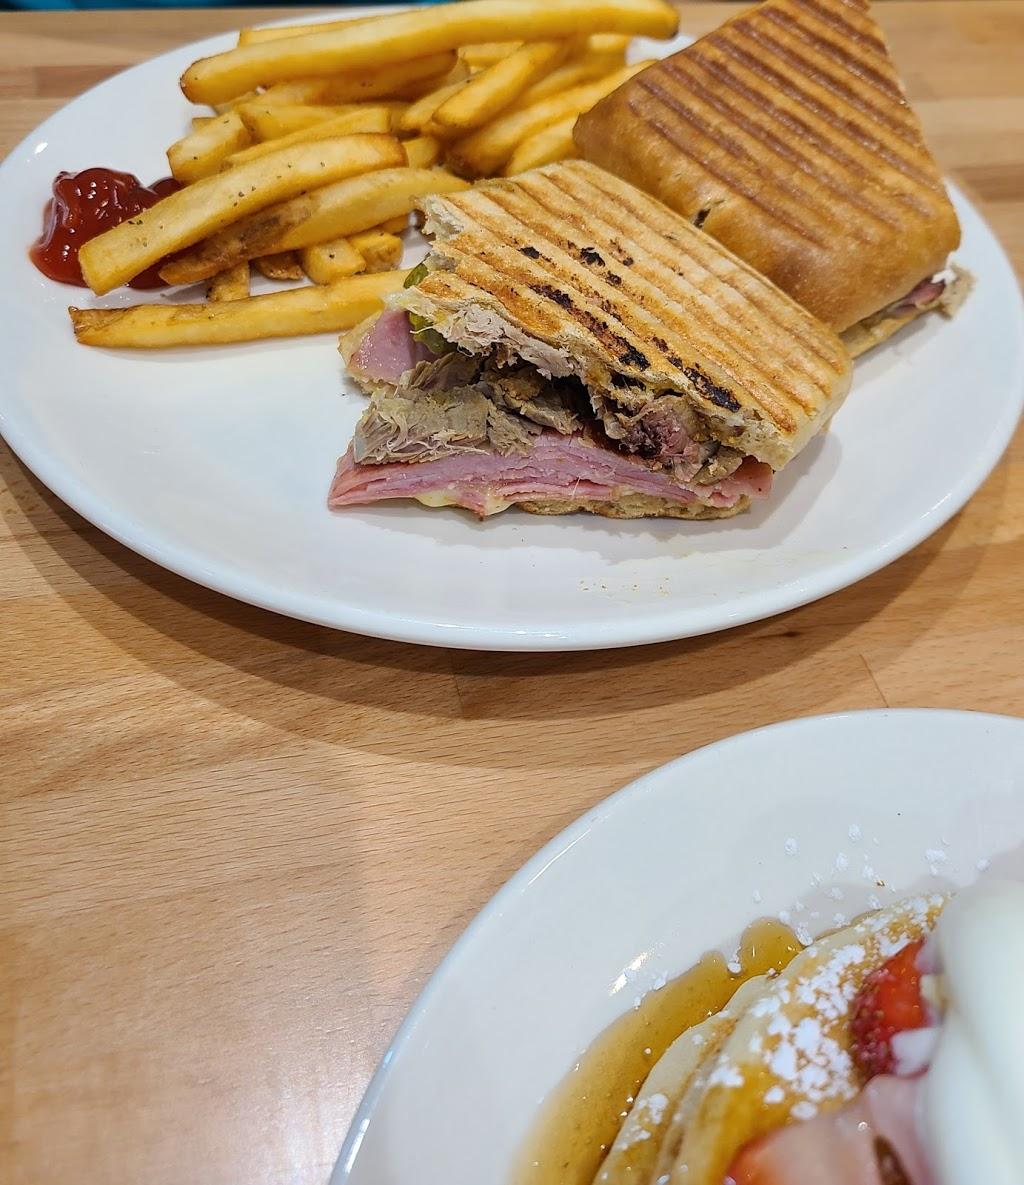 Starwood Cafe - Trophy Club - restaurant    Photo 1 of 4   Address: 2240 TX-114, Trophy Club, TX 76262, USA   Phone: (682) 502-4505